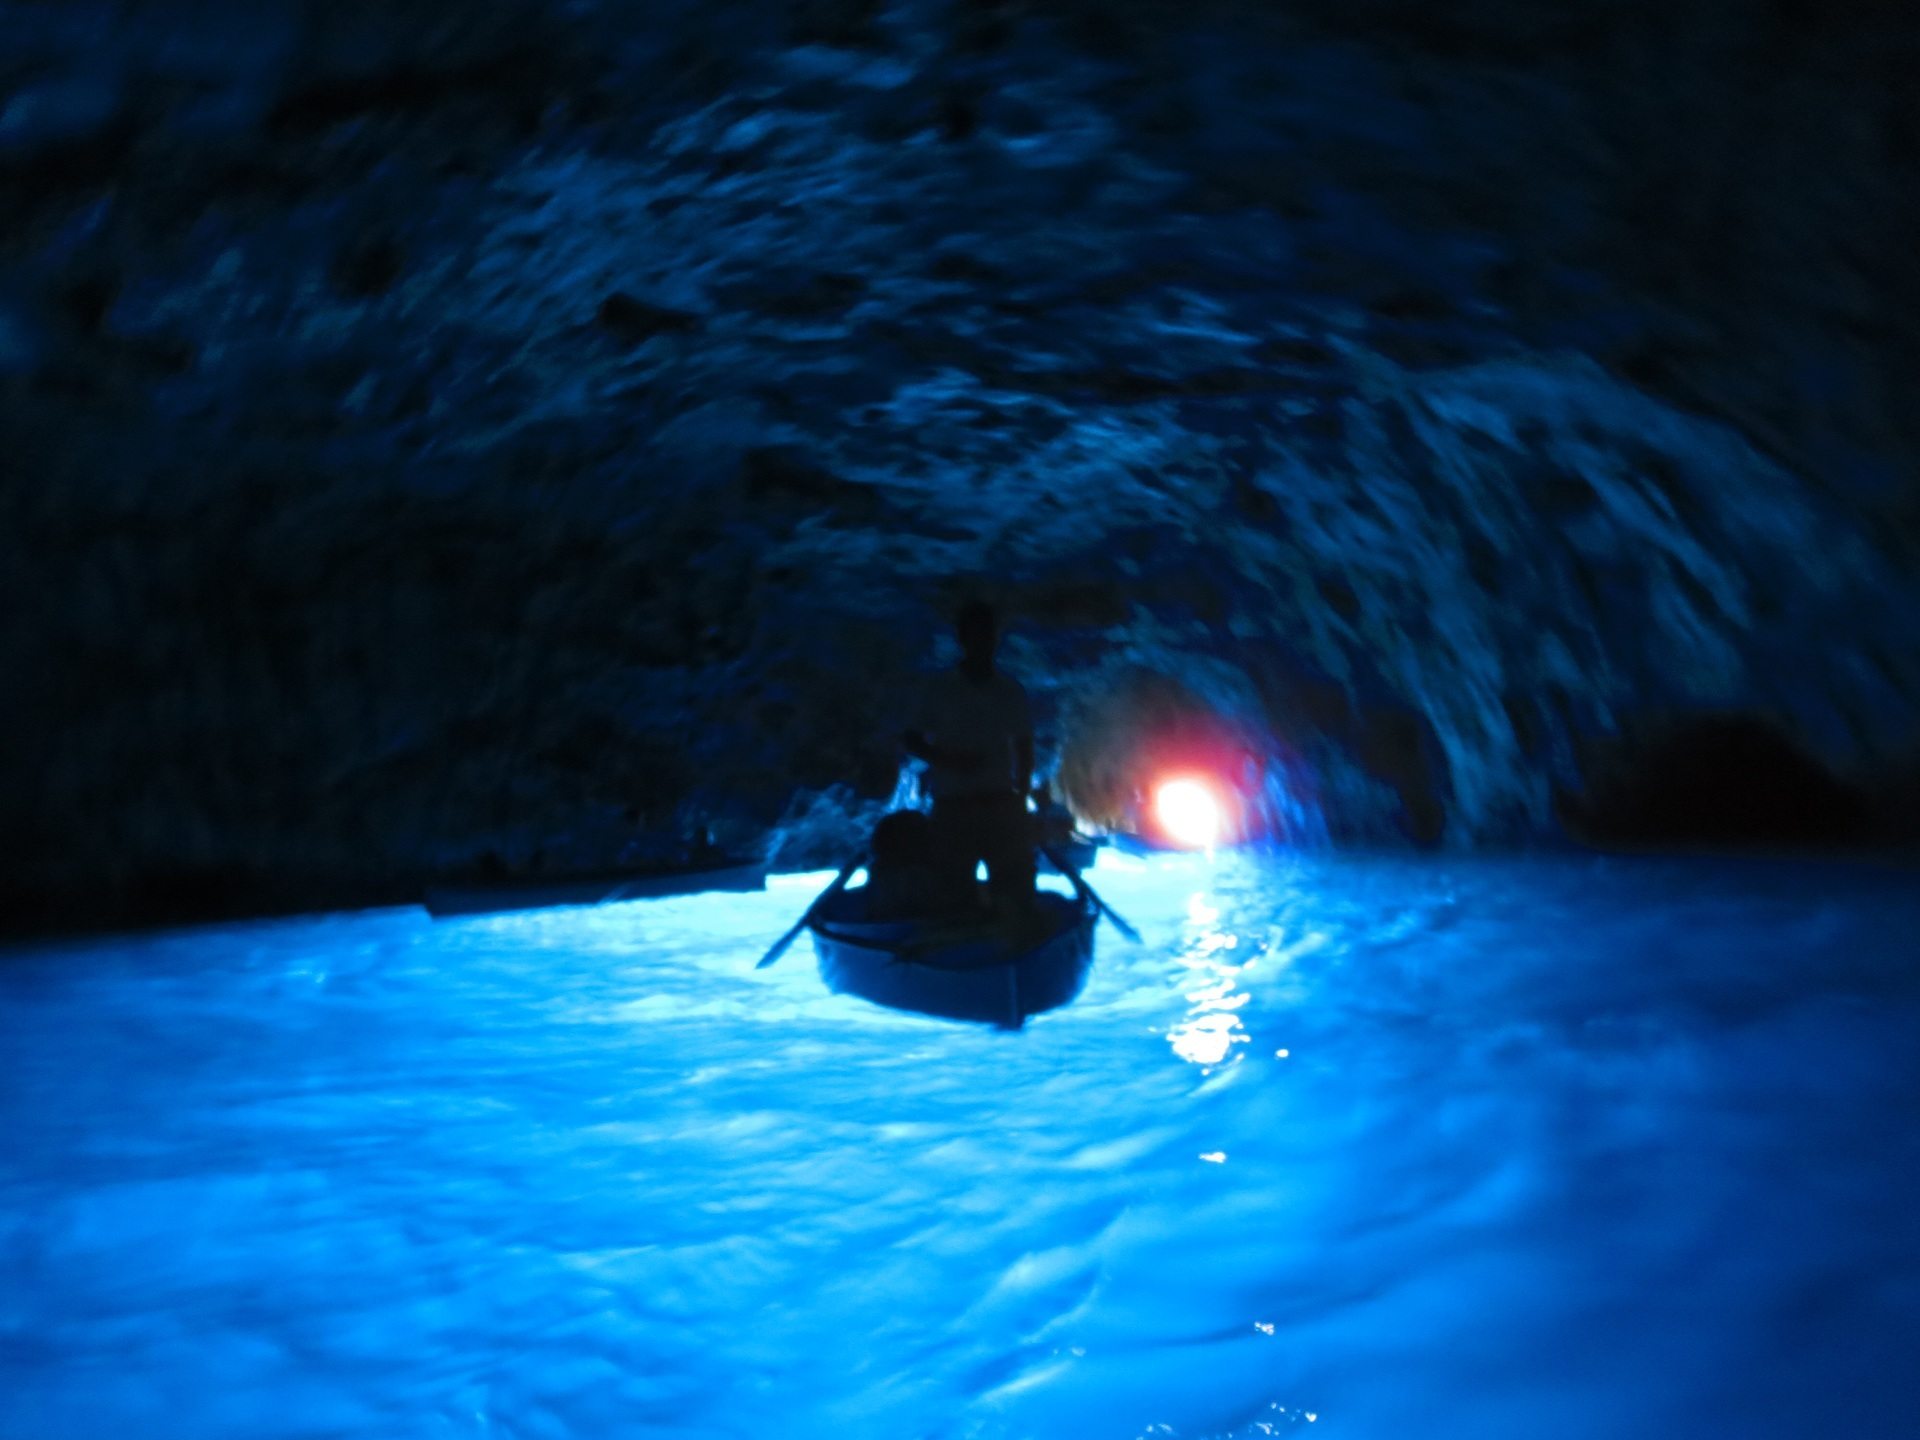 grotta-azzurra-capri-hp